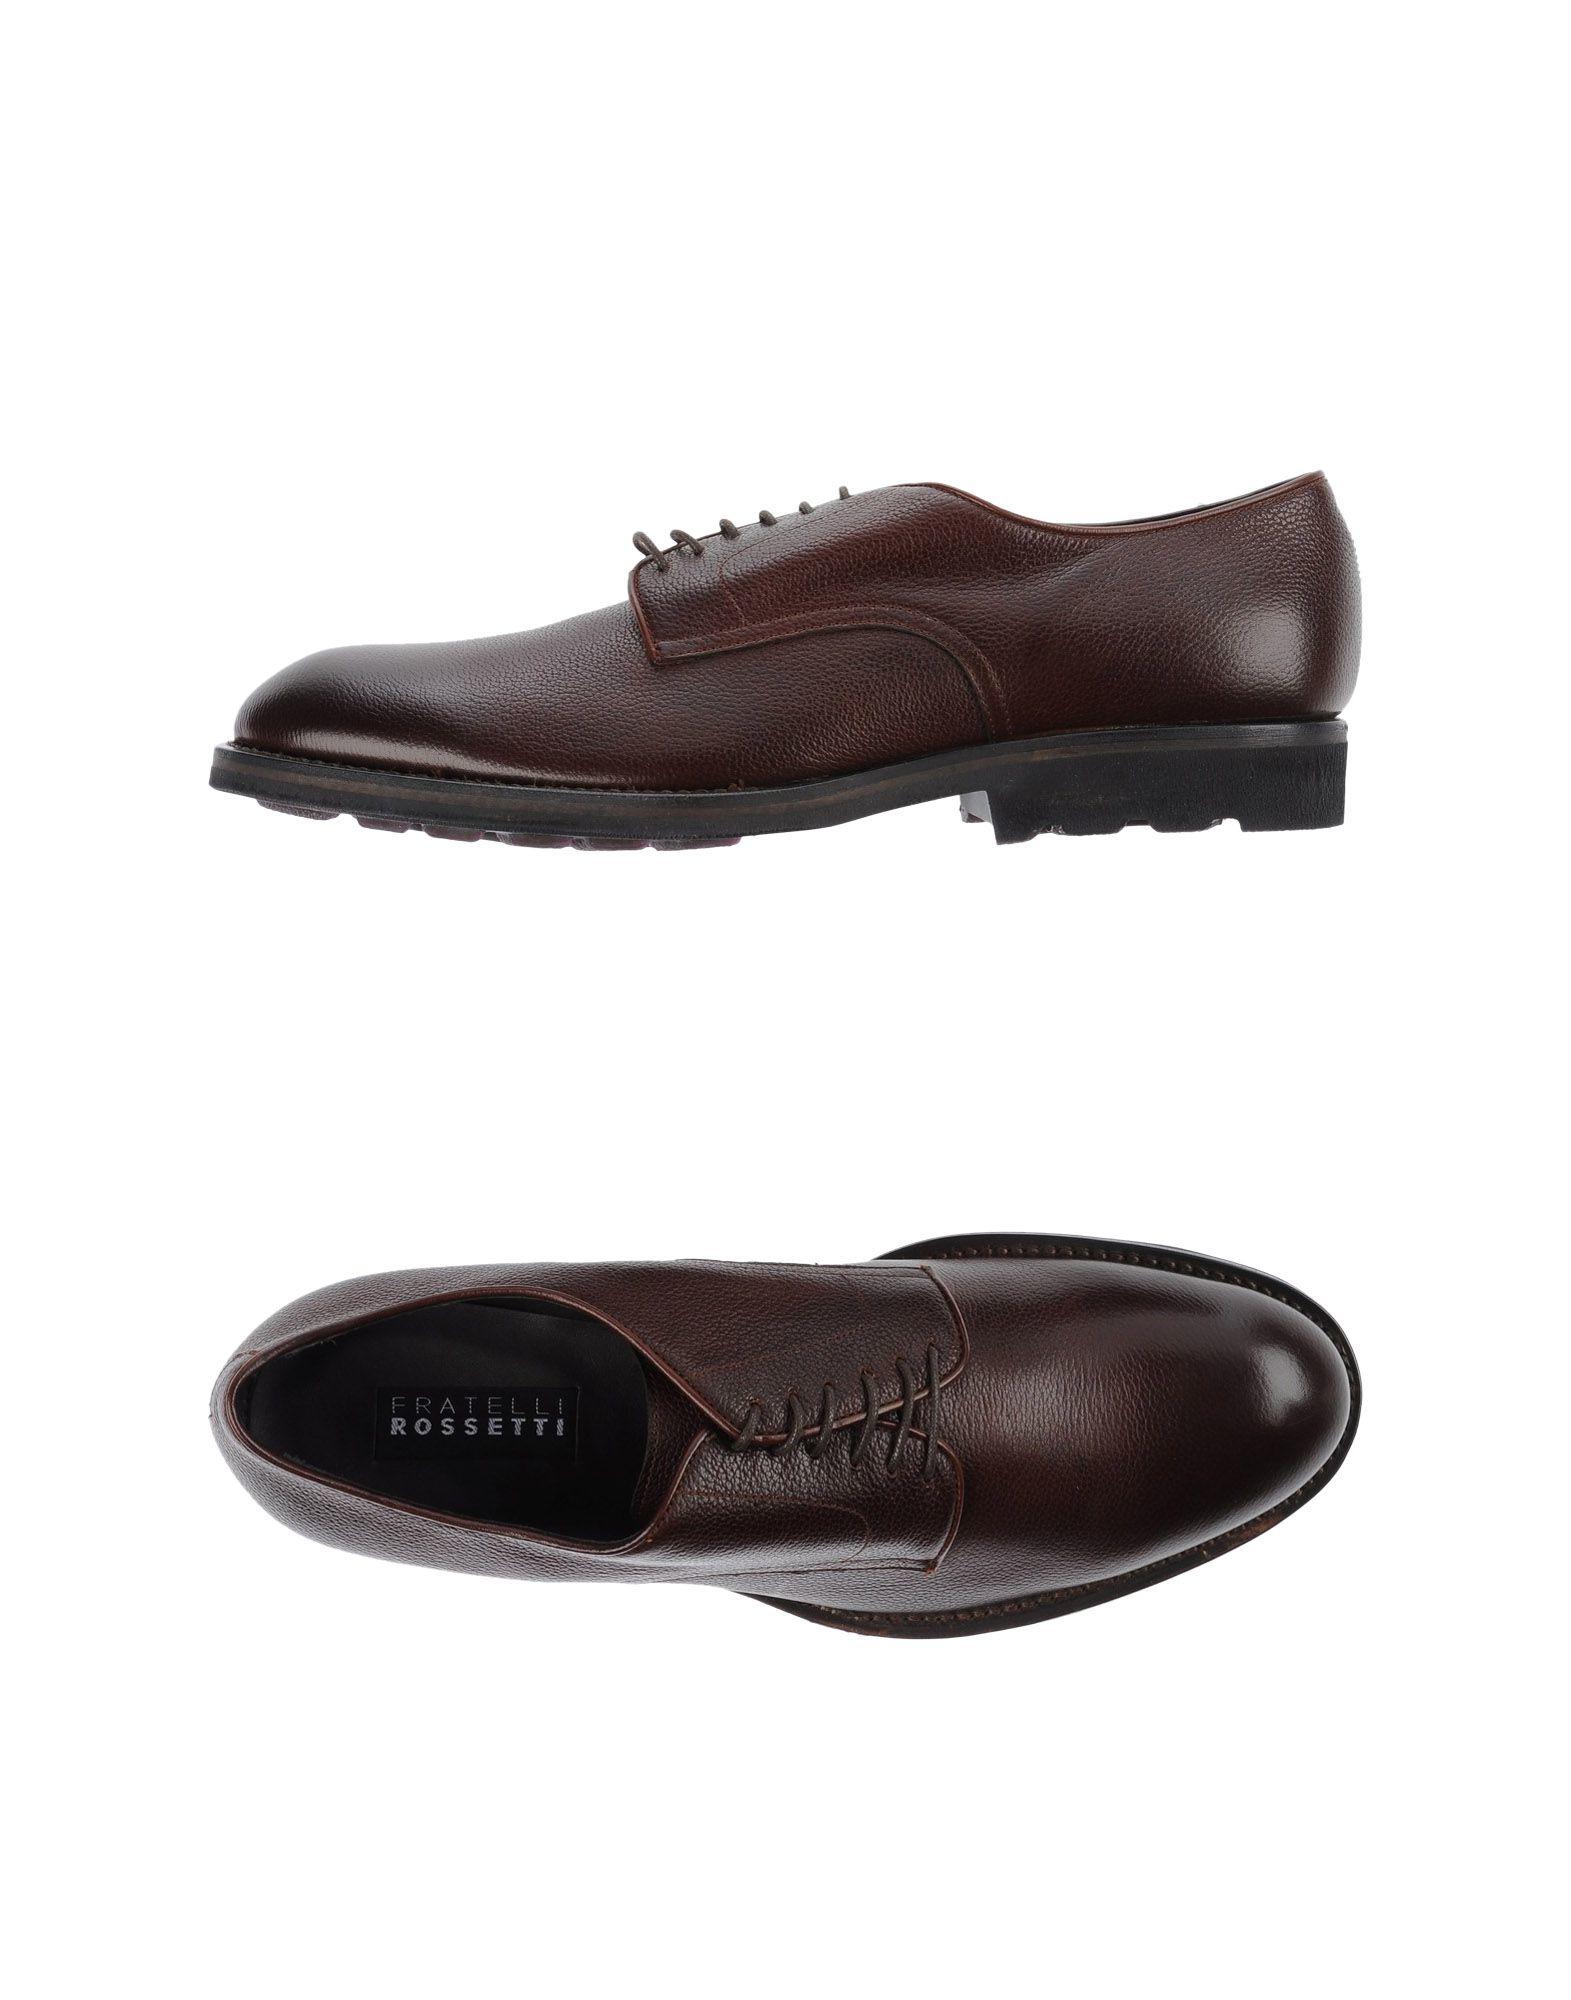 Fratelli Rossetti Shoe Size